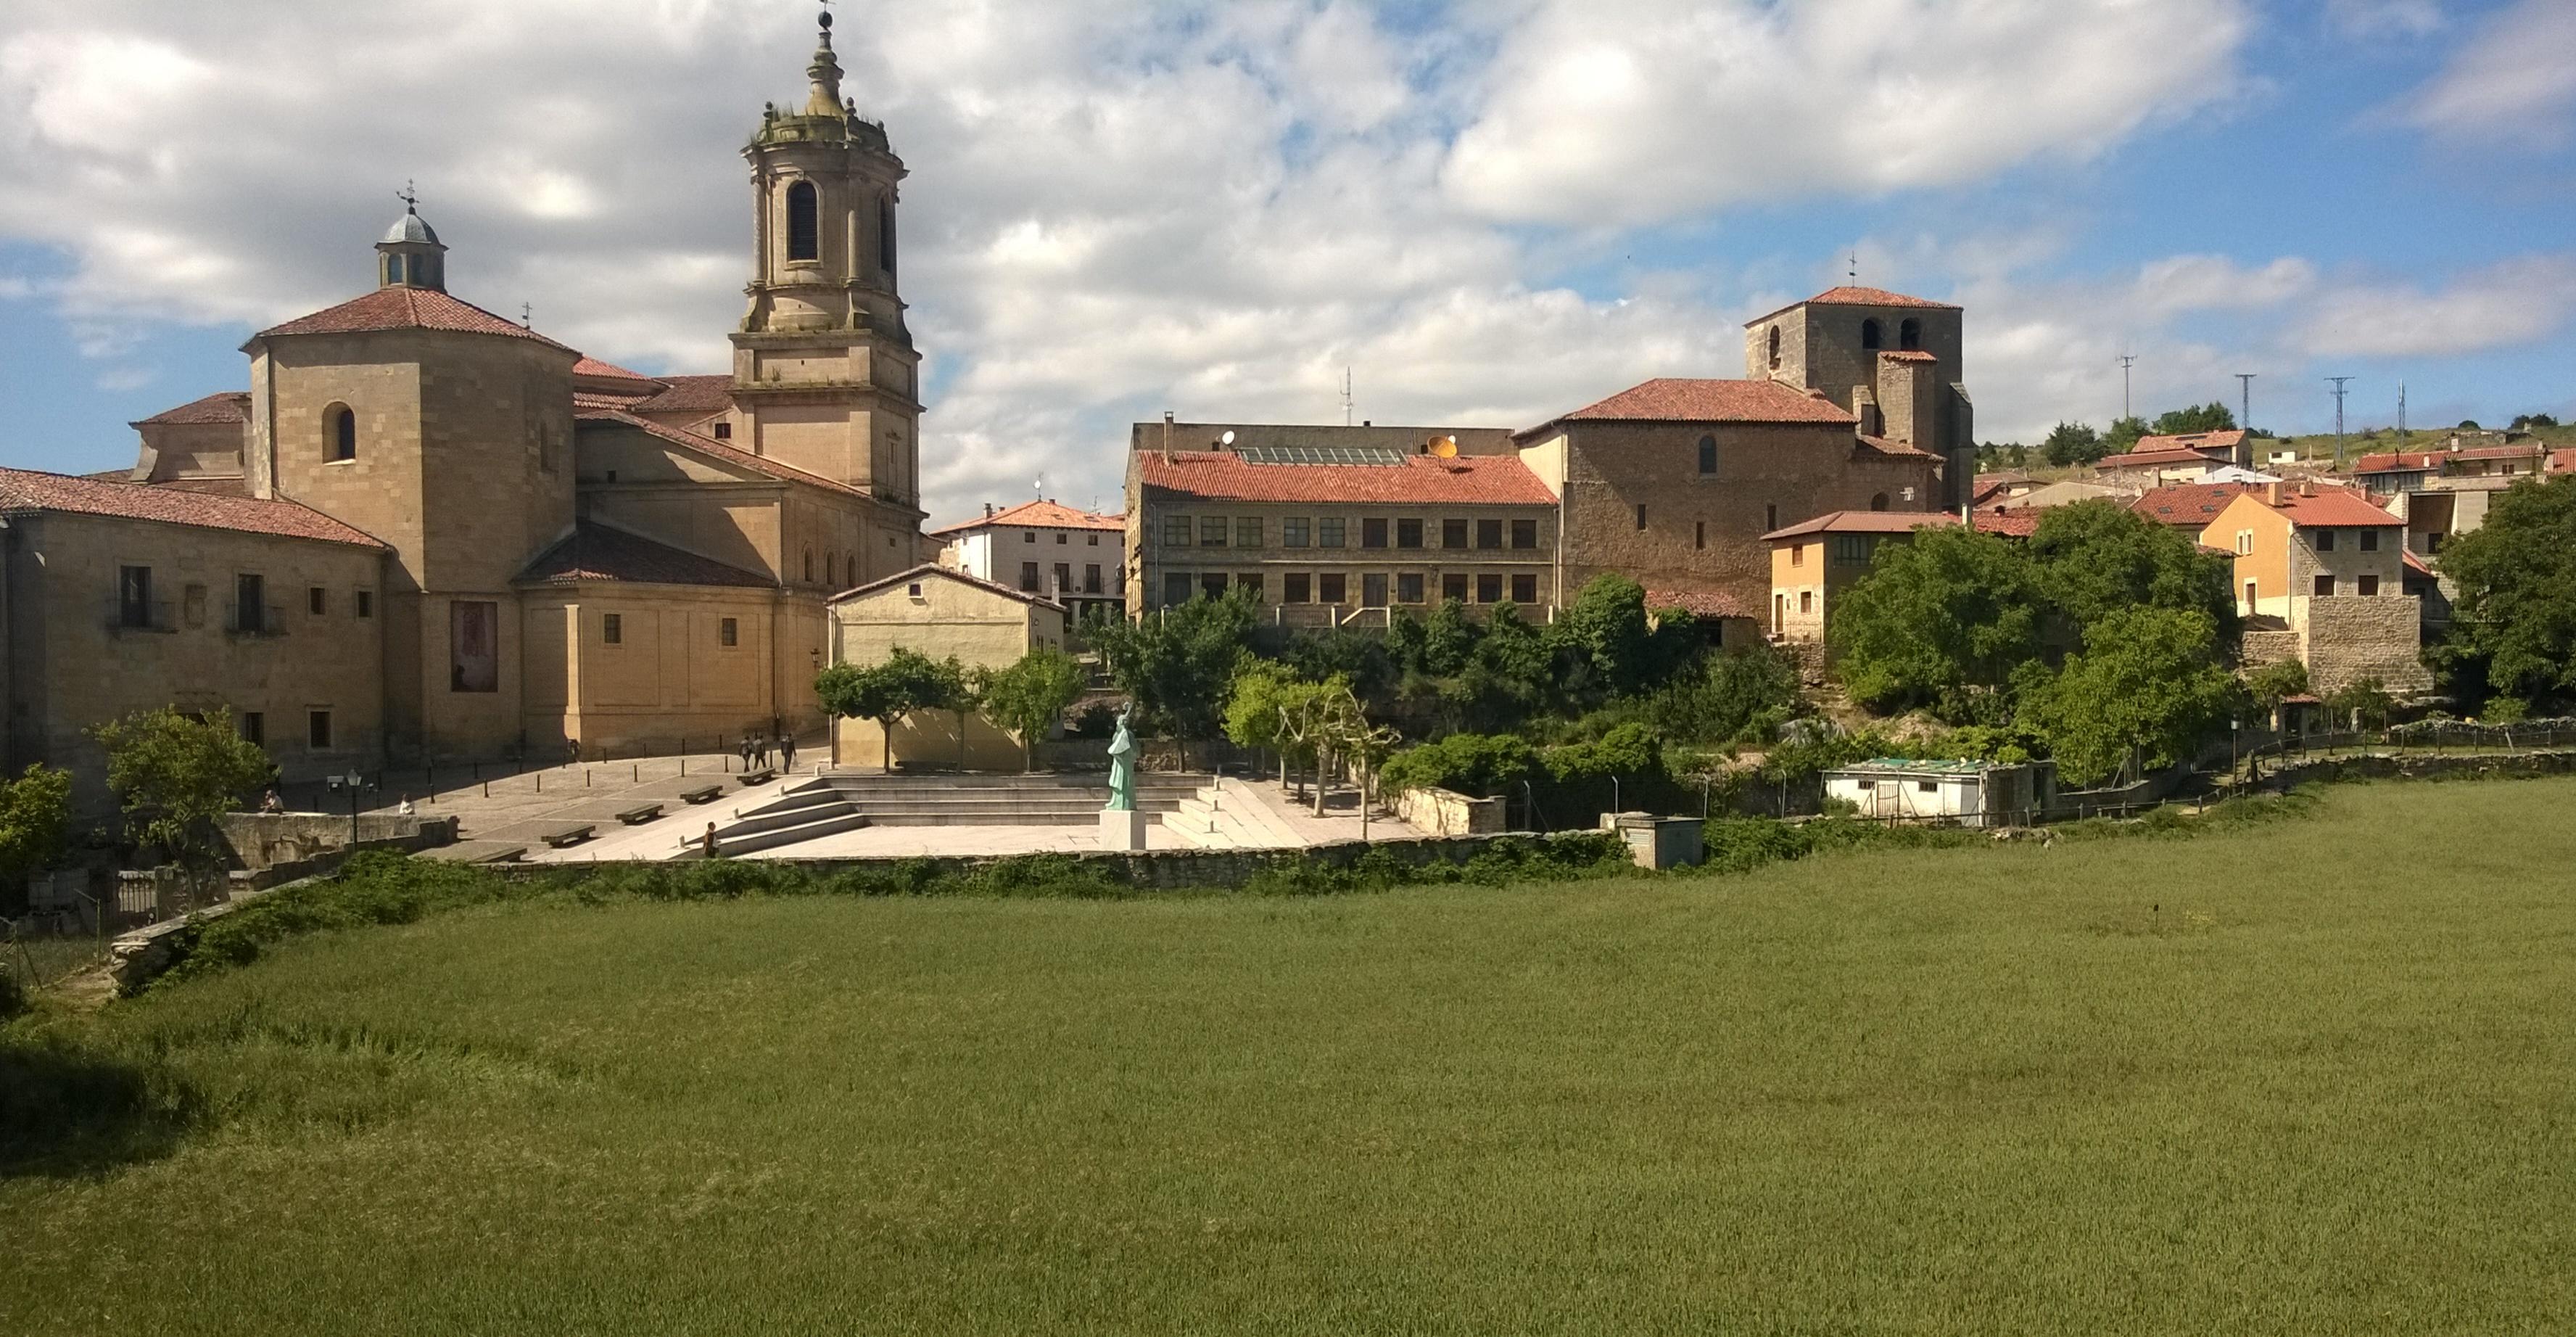 Iglesia del monasterio de Santo Domingo, desde la ventana de mi hotel.